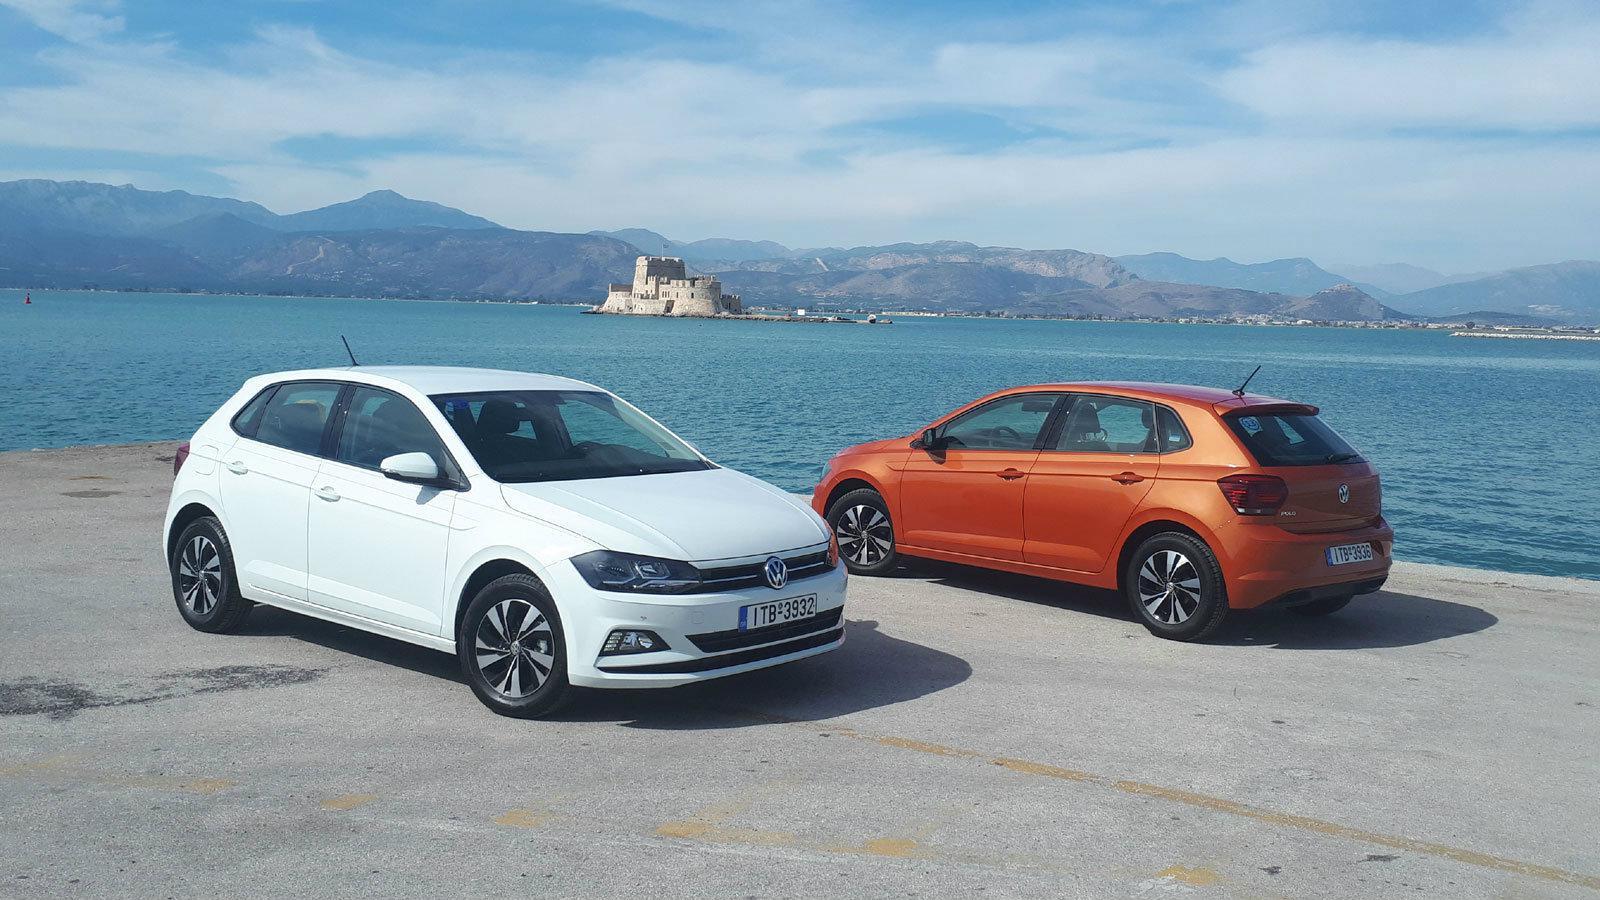 56092024fd28 Τιμές νέου VW Polo στην Ελλάδα - volkswagen polo